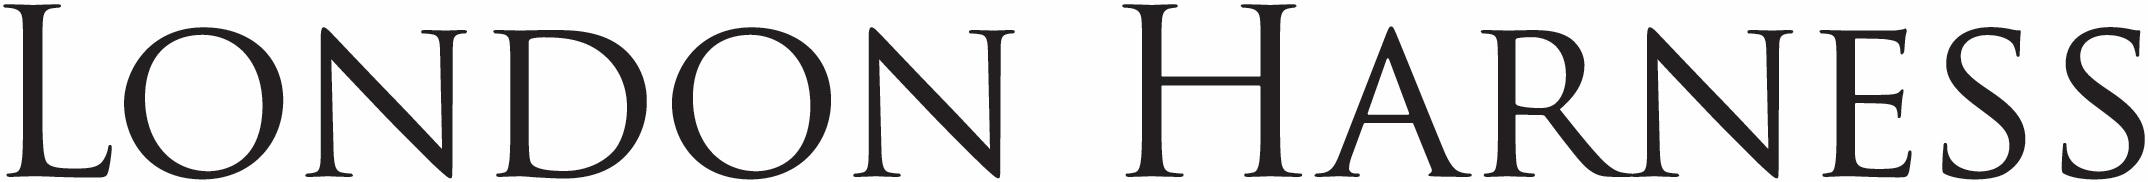 lh-logo-only-1909a.jpg